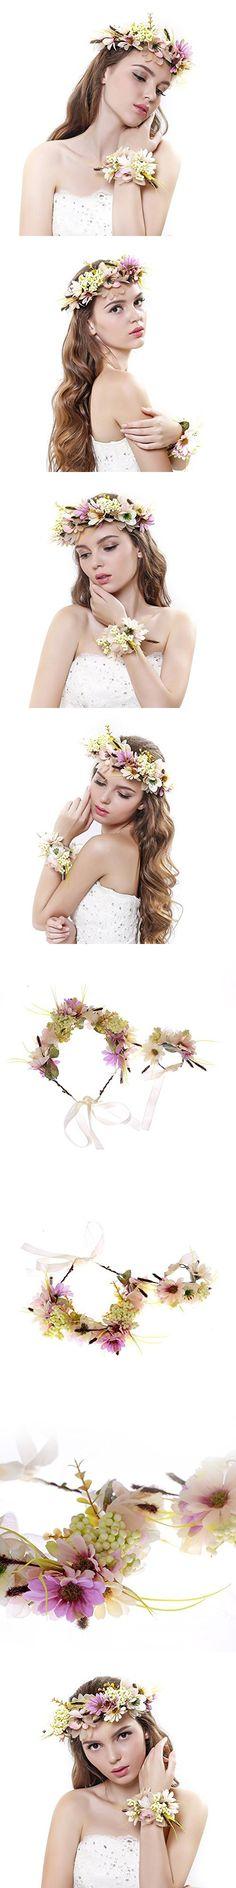 2pc/set Flower Wreath Headband with Floral Wrist Band for Wedding Festivals